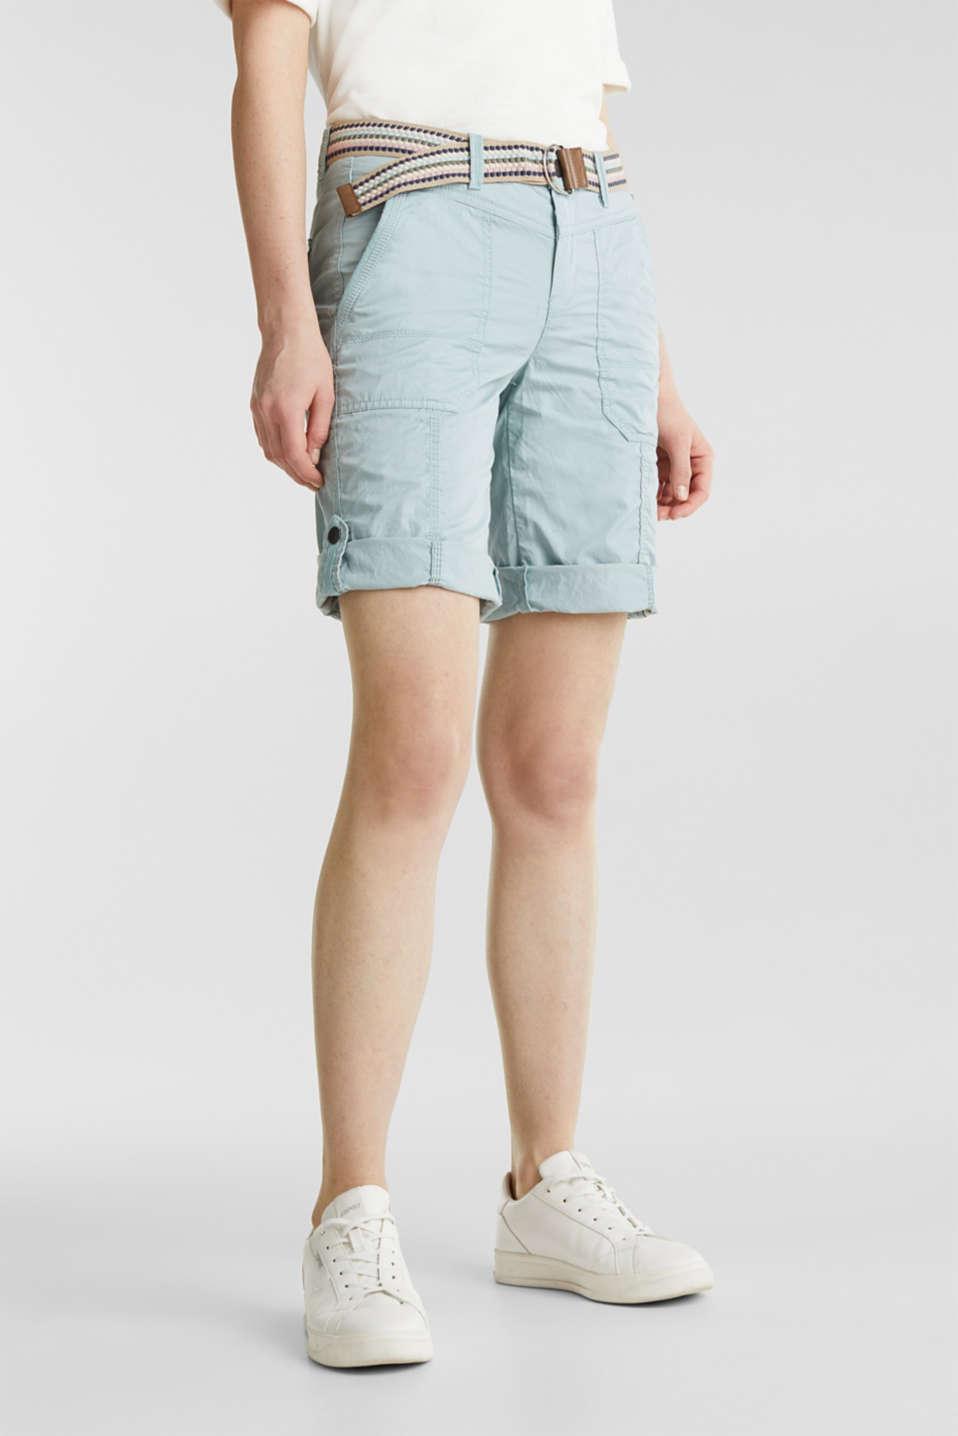 PLAY cotton shorts, LIGHT AQUA GREEN, detail image number 6